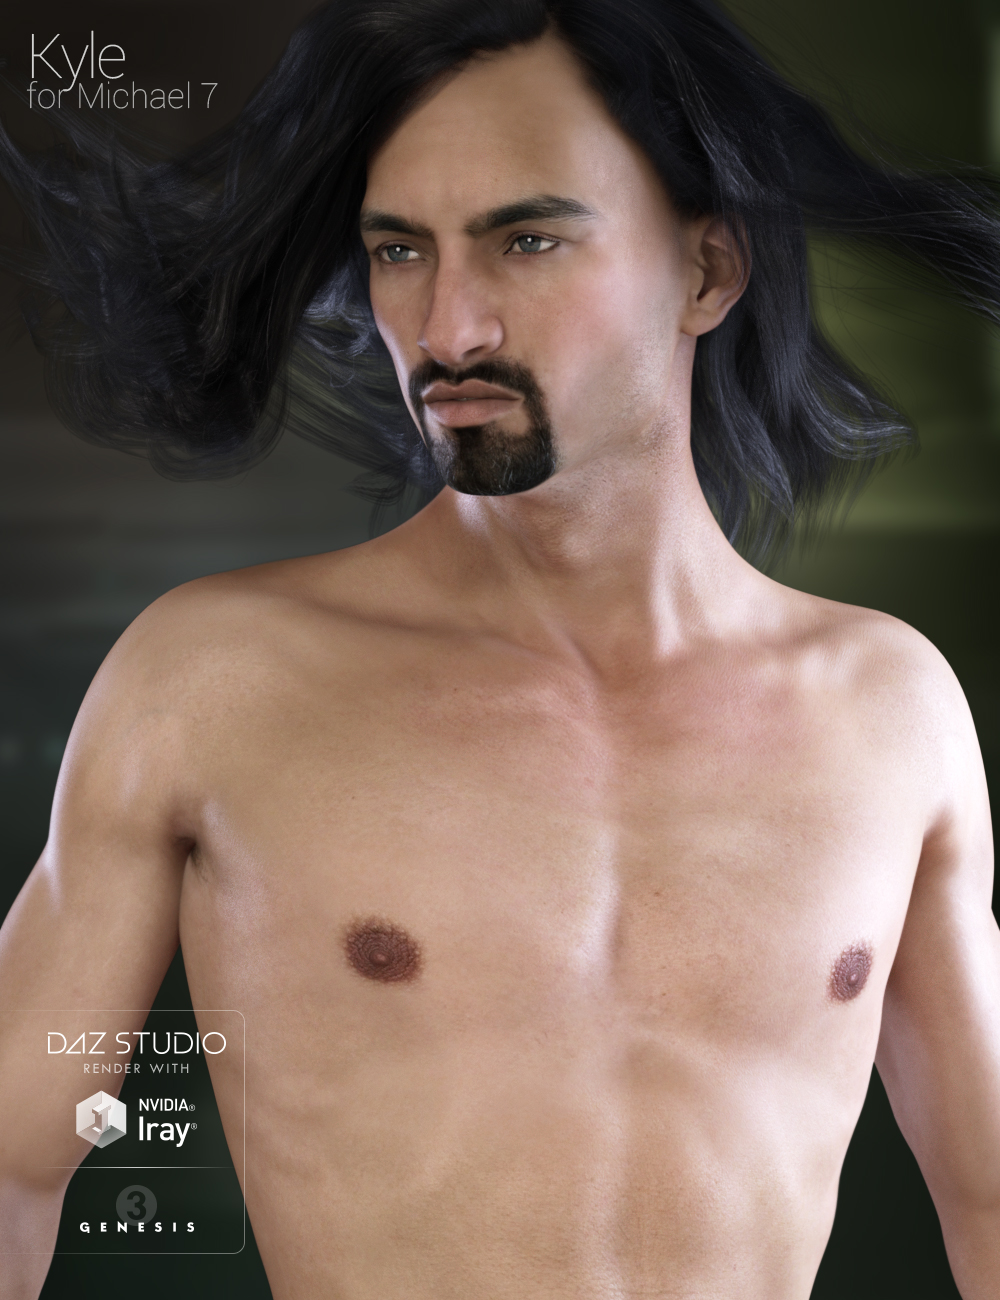 Kyle HD for Michael 7 by: Raiya, 3D Models by Daz 3D